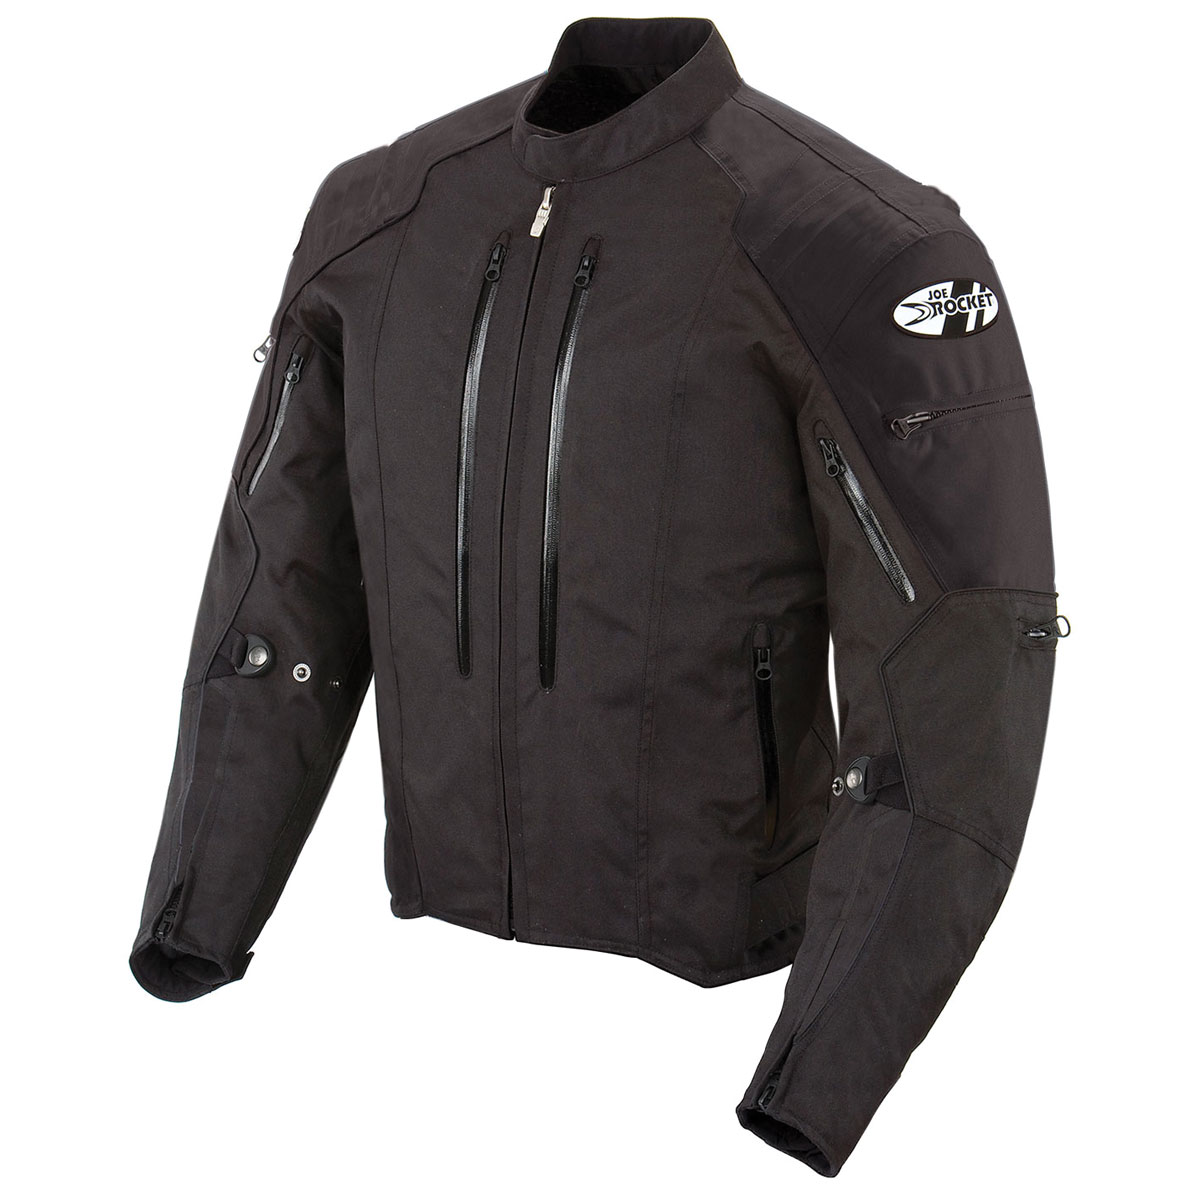 Joe Rocket Men's Atomic 4.0 Waterproof Black Jacket